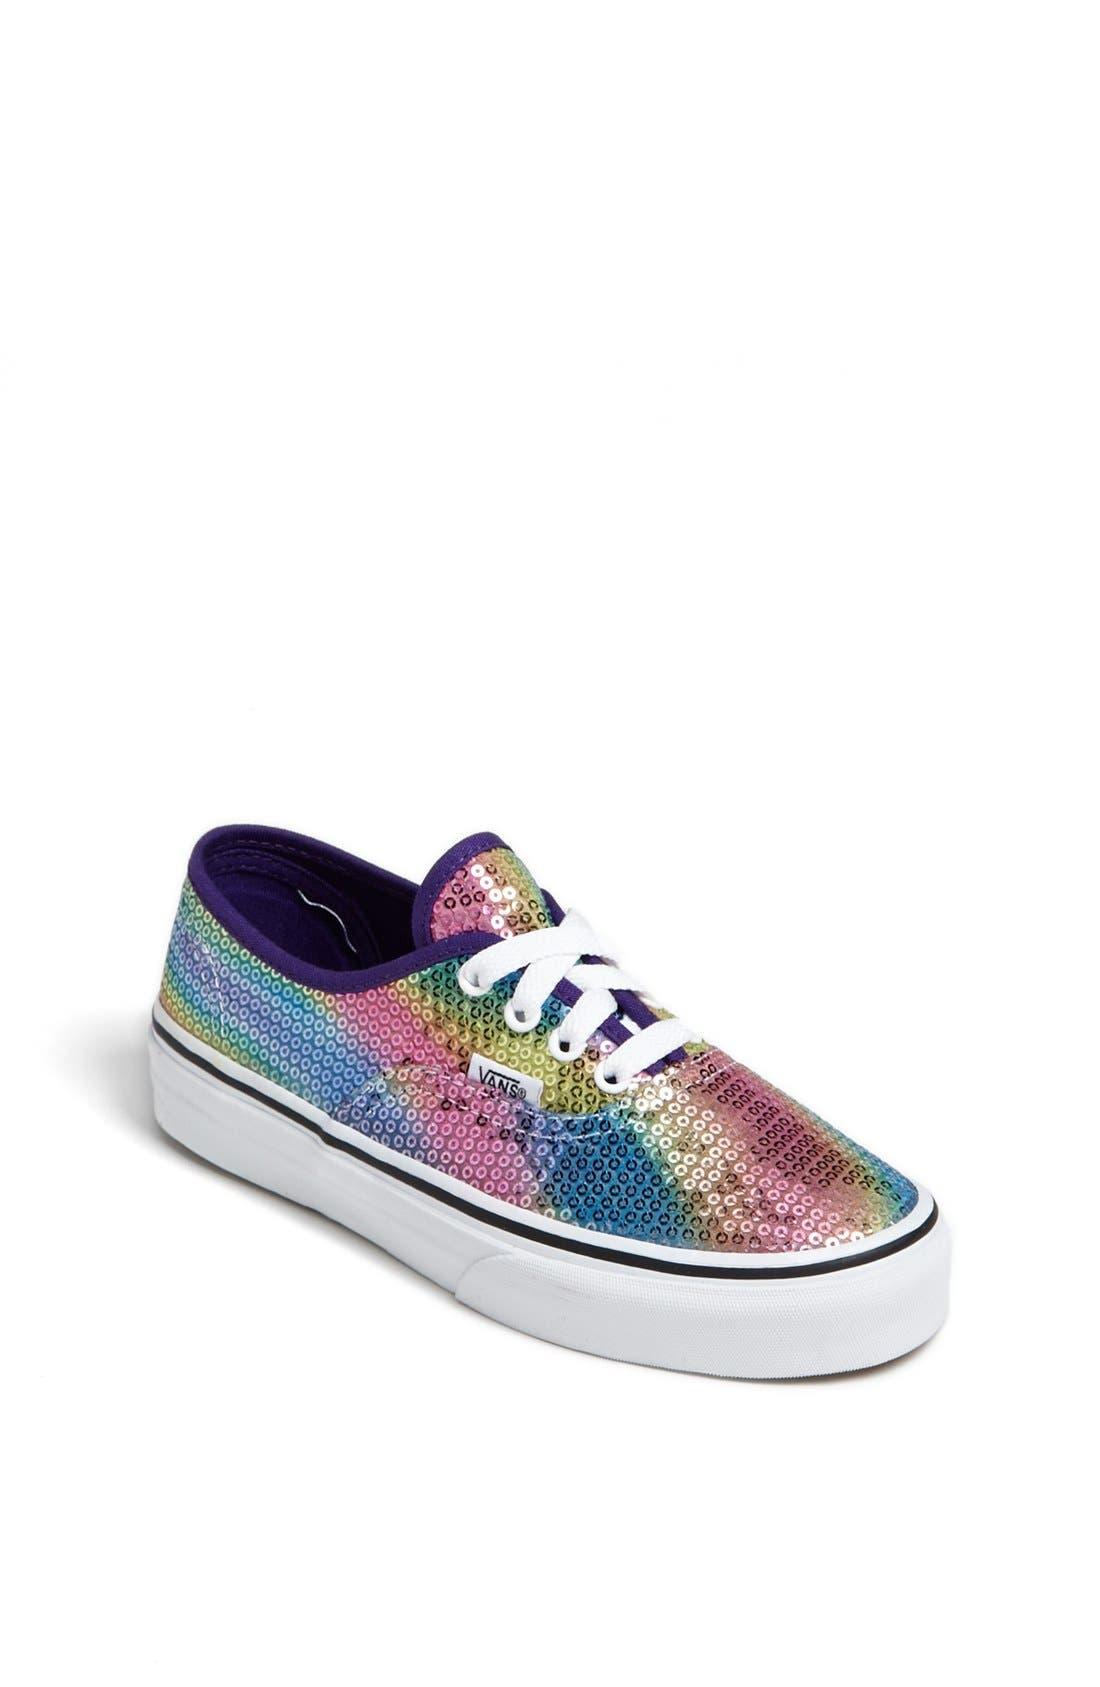 Alternate Image 1 Selected - Vans 'Classic - Rainbow Sequin' Sneaker (Toddler, Little Kid & Big Kid)